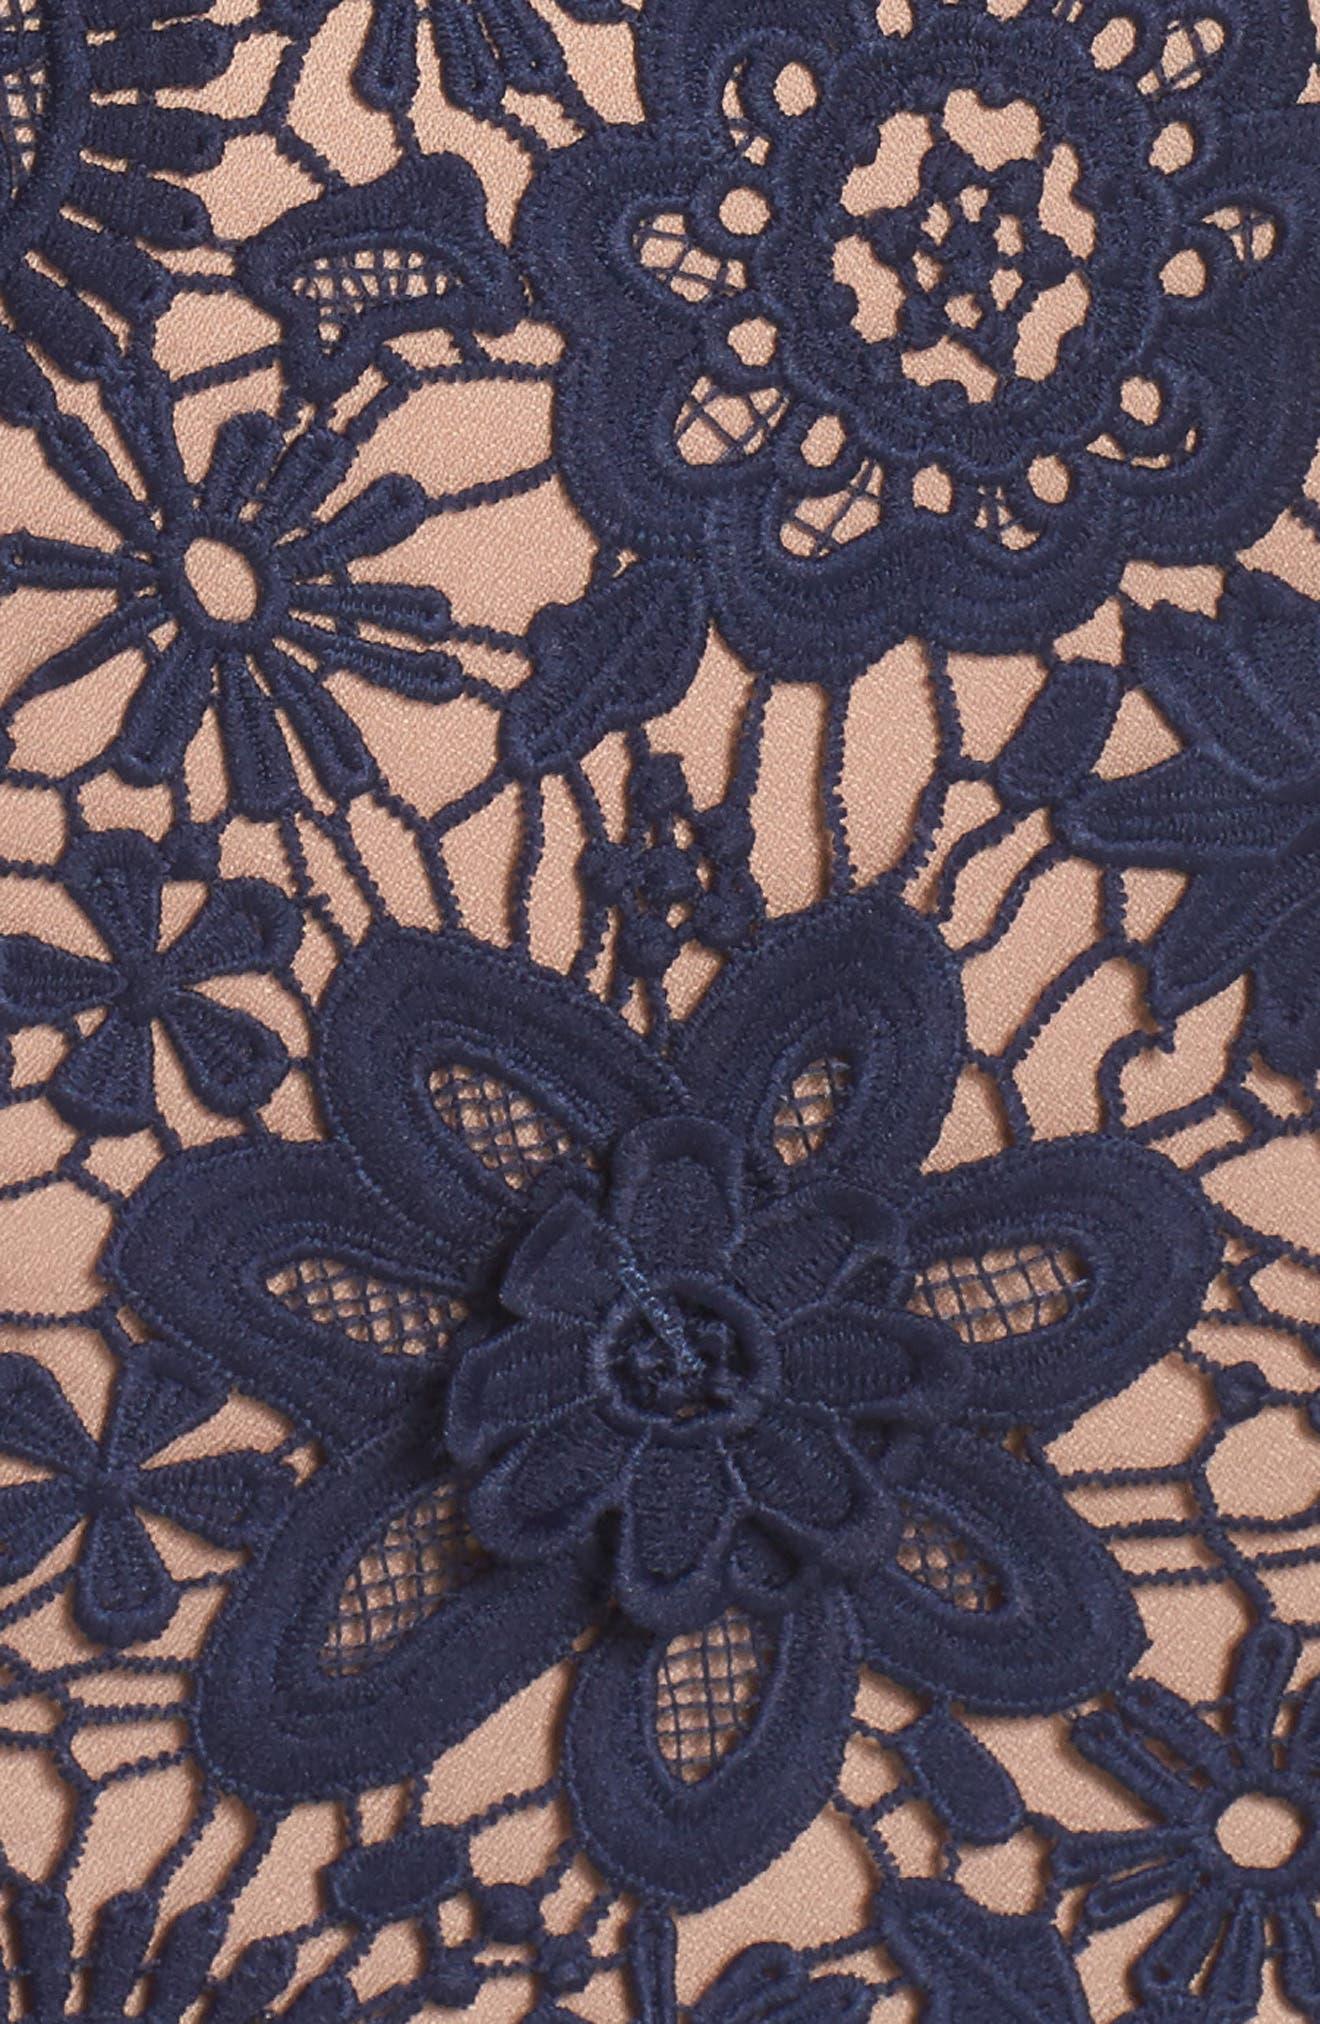 Merrilee Off the Shoulder 3D Lace Dress,                             Alternate thumbnail 5, color,                             NAVY